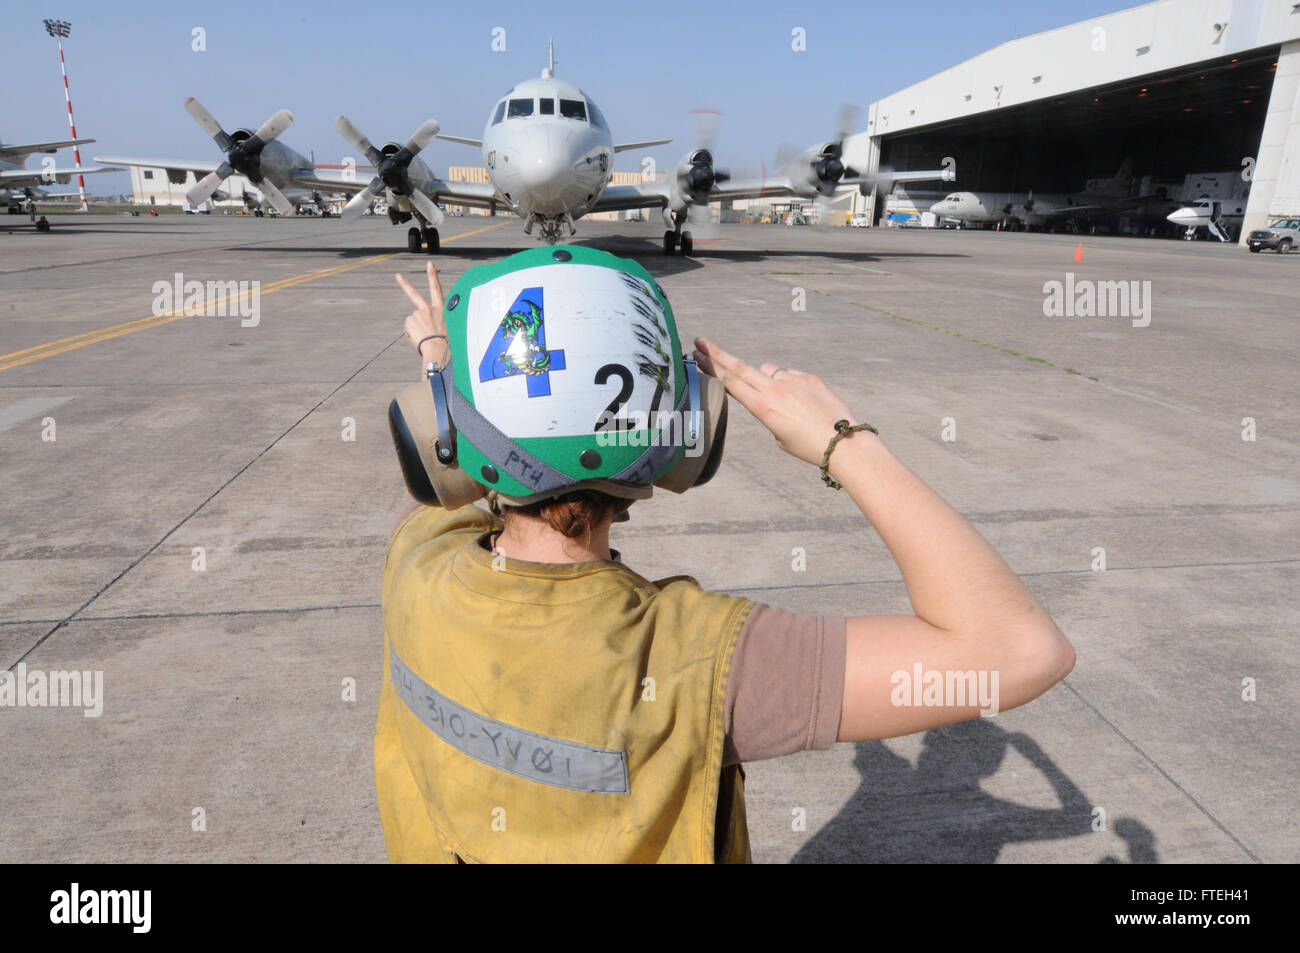 SIGONELLA, Sicily (Oct. 10, 2014) - Aviation Structural Mechanic 2nd Class Margaret Mele signals a P-3C Orion maritime - Stock Image